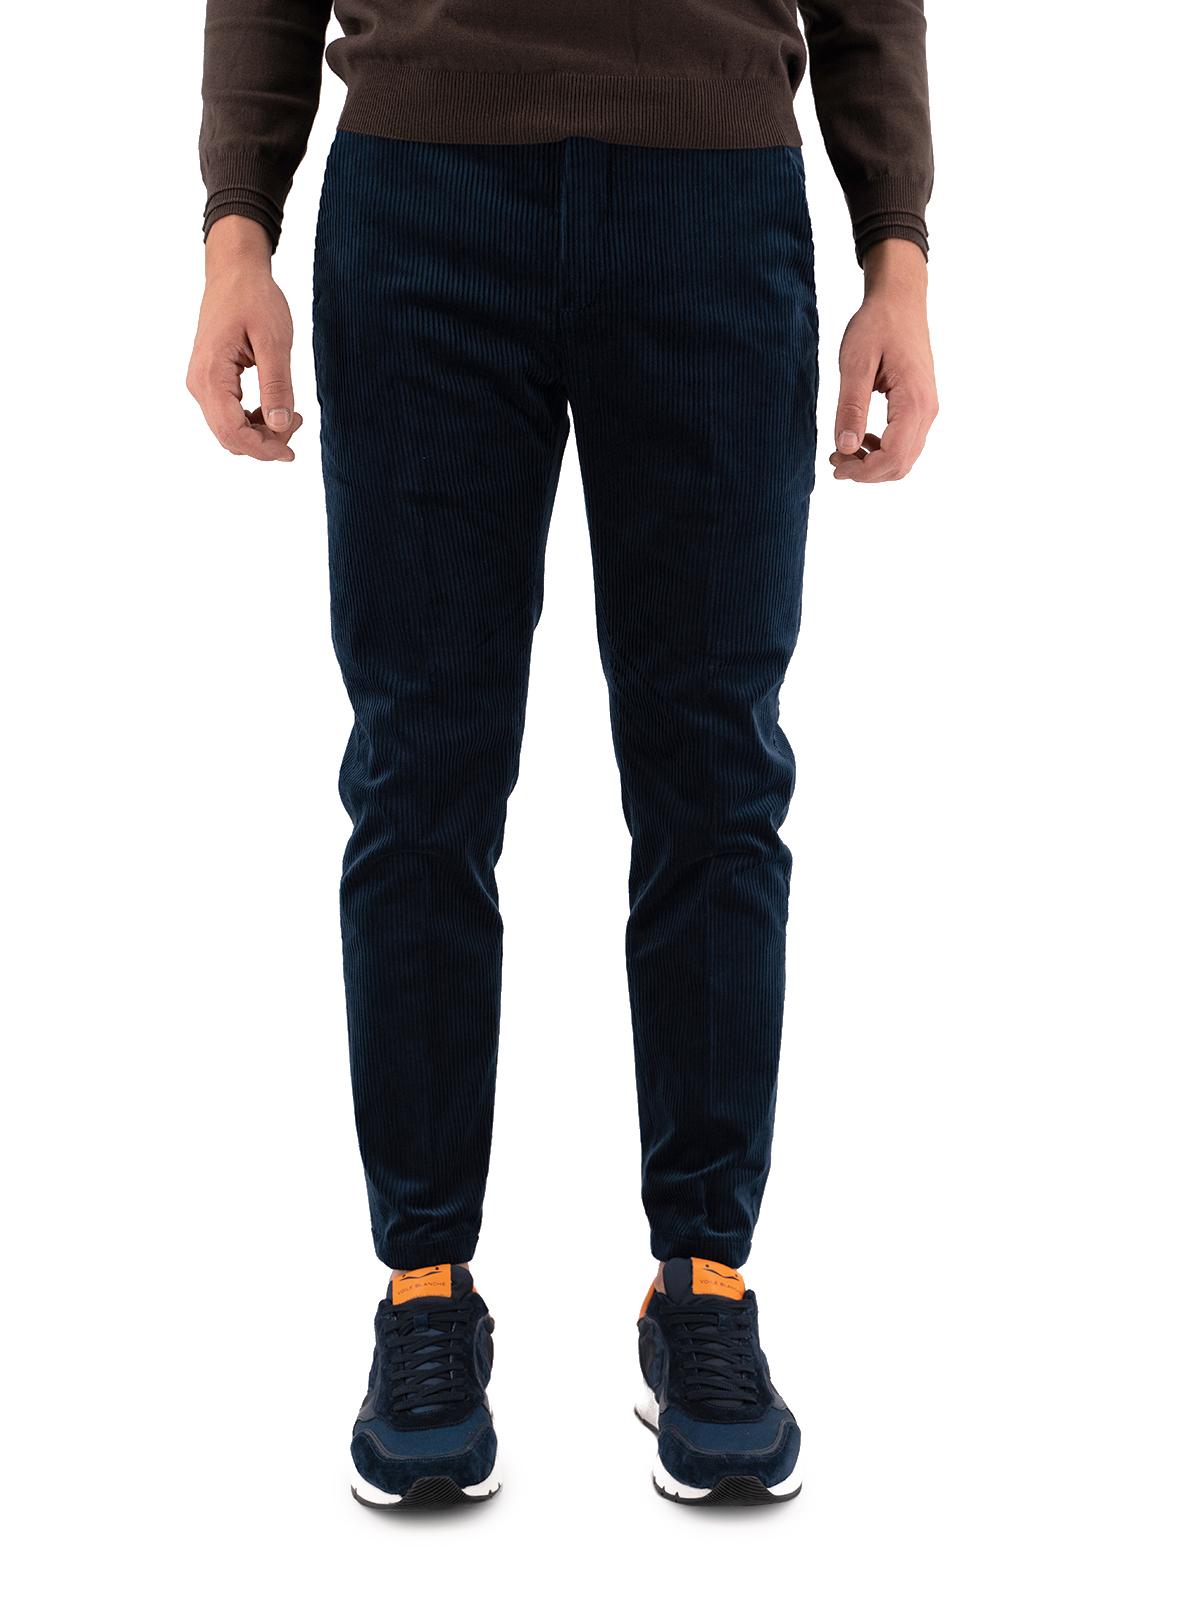 Department Five Pantalone U19P05 F1920 PRINCE